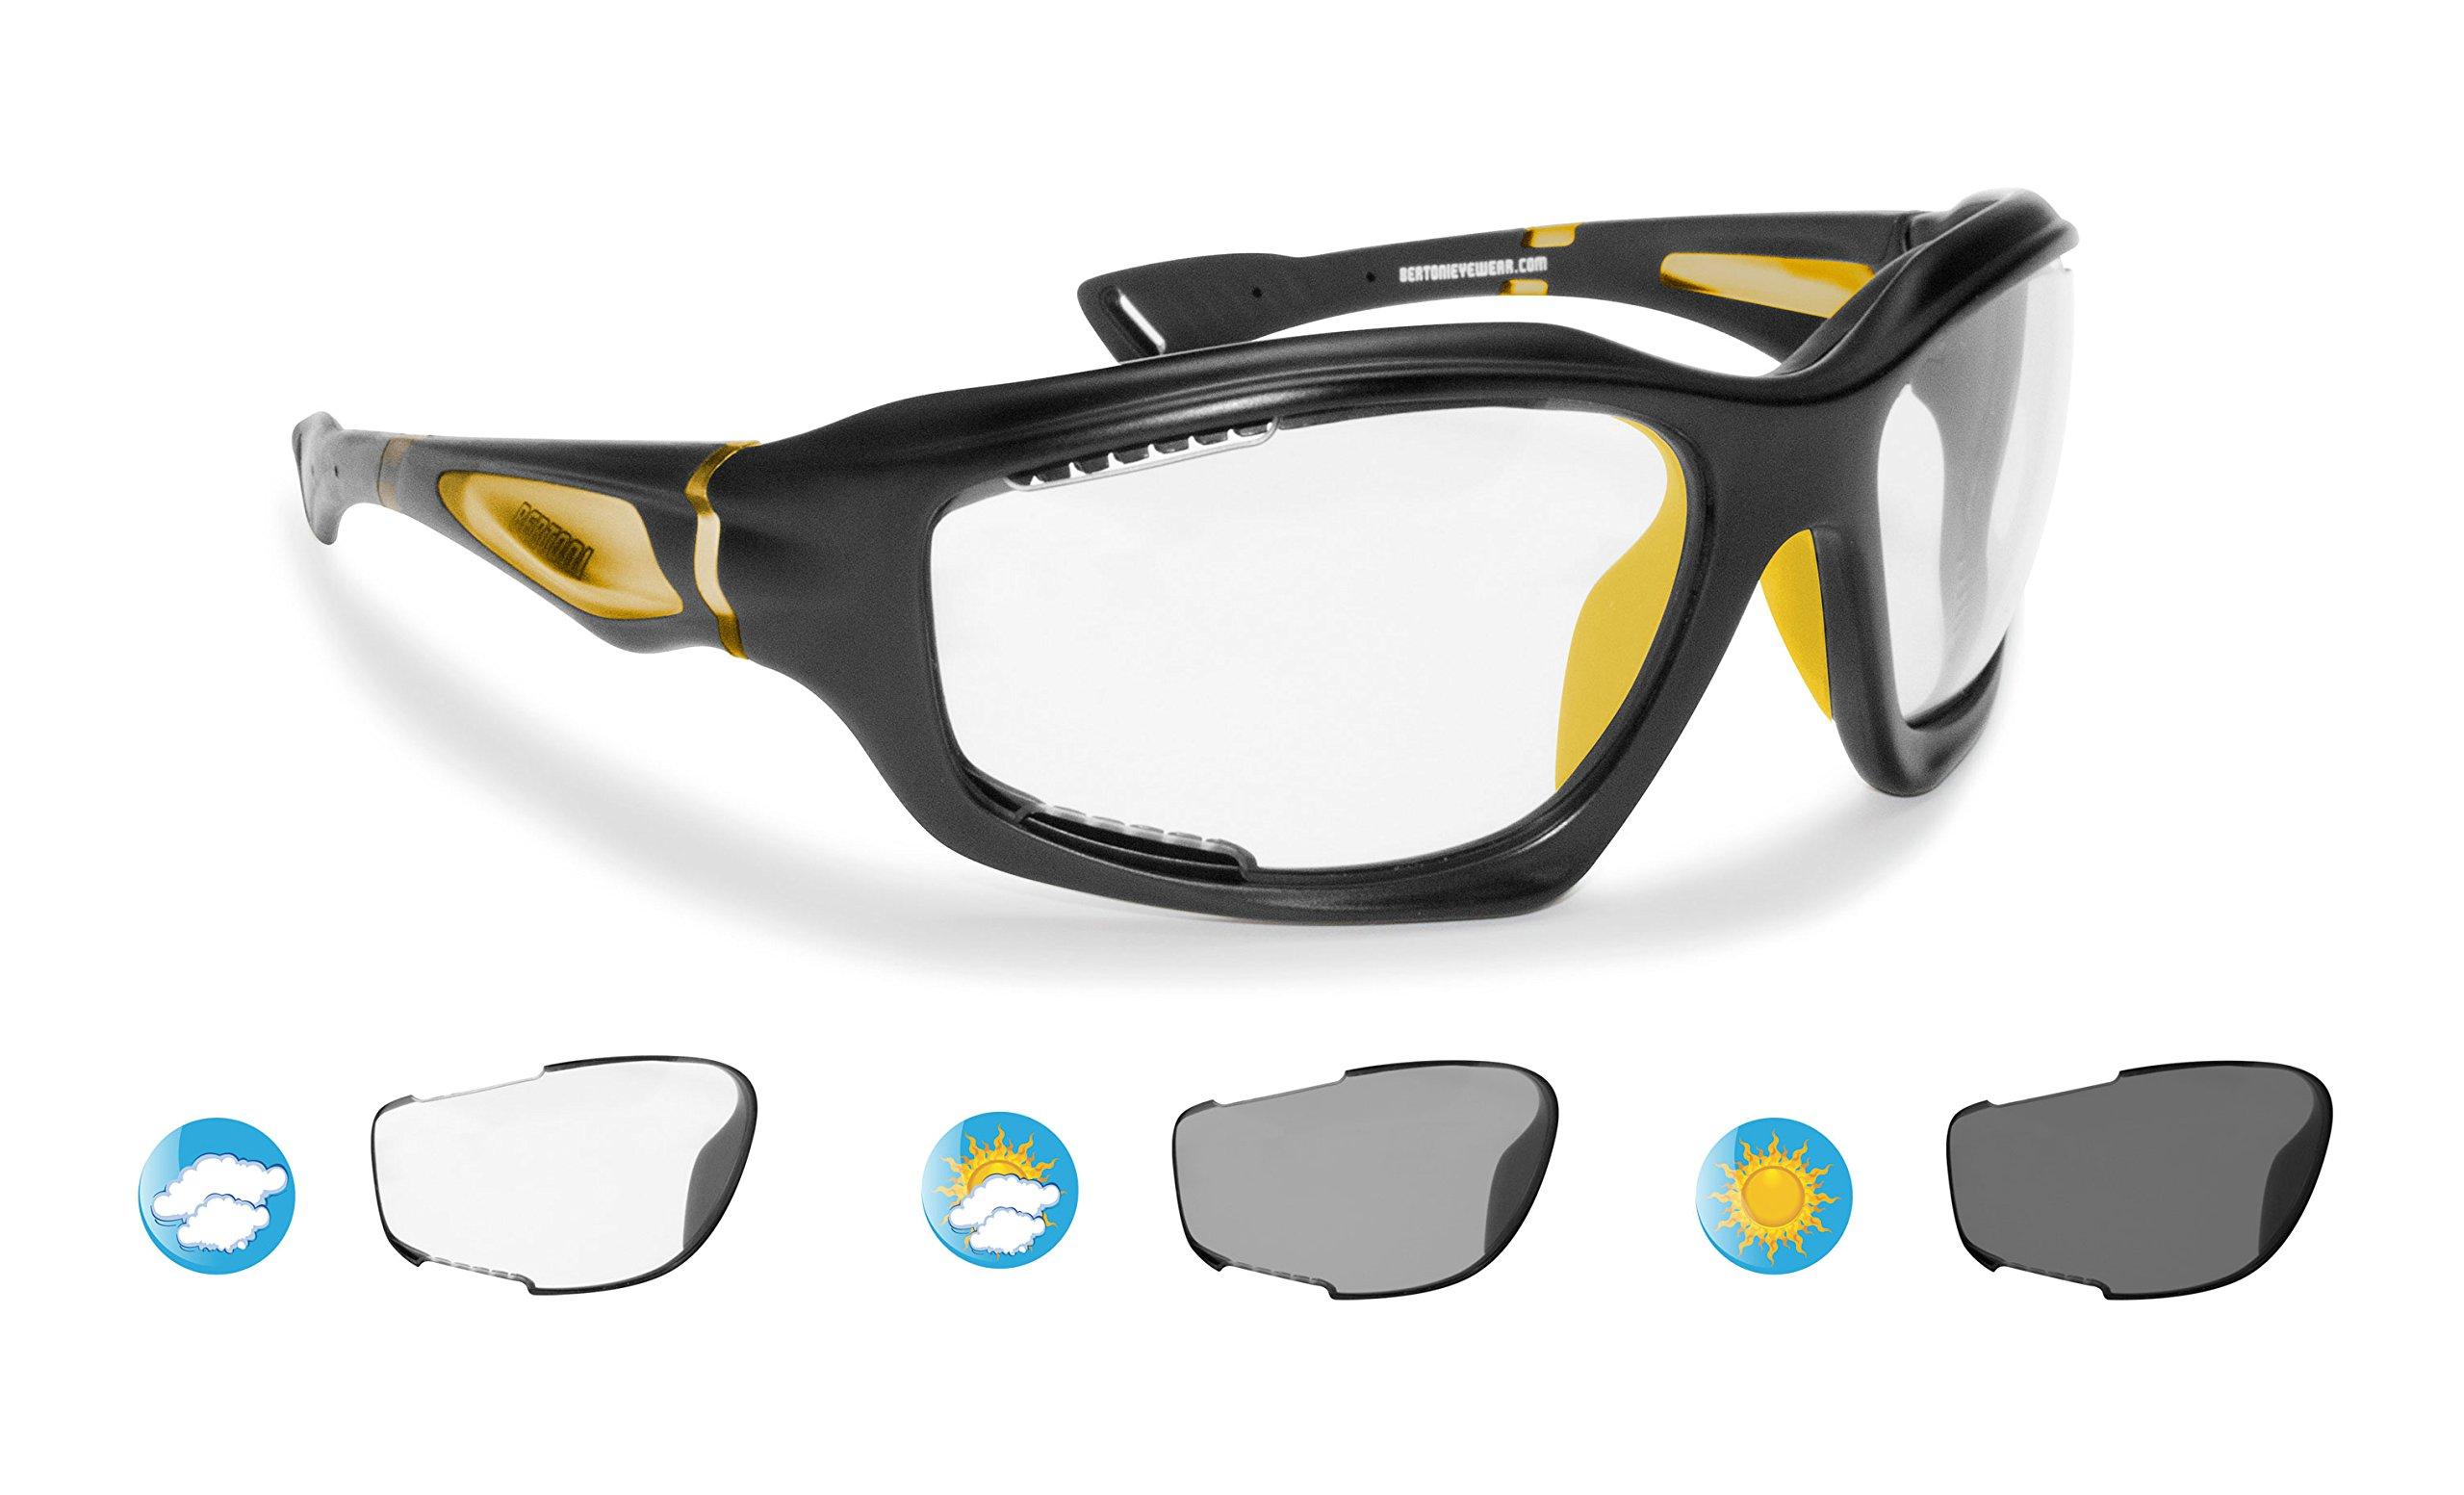 Bertoni Sport Sunglasses Photochromic cat. 0-3 Antifog for Cycling Running Golf Ski Watersports - F1000C1 Wraparound Windproof Glasses (Mat Black/Yellow, Photochromic Antifog)